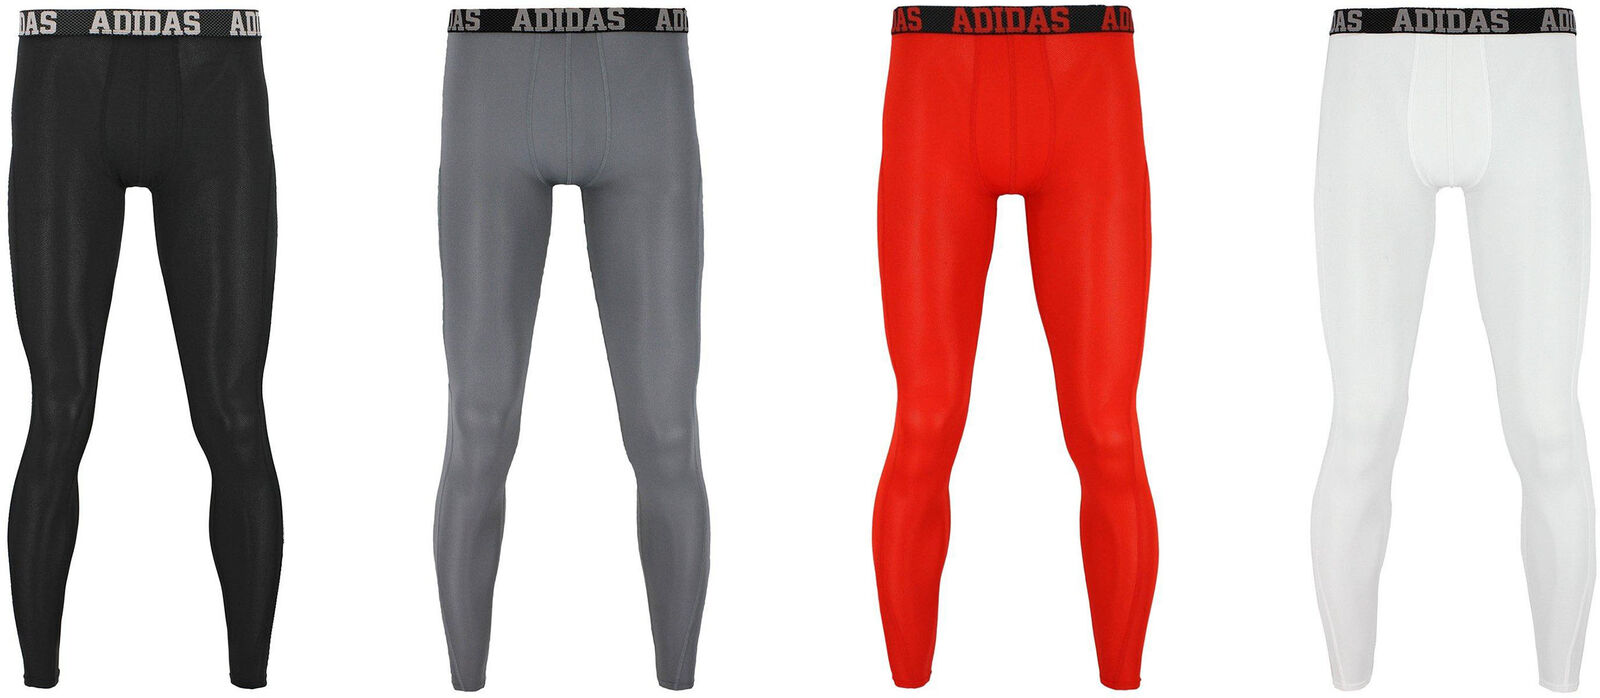 Adidas Men's Baselayer Climacool UPF Pants, 4 colors